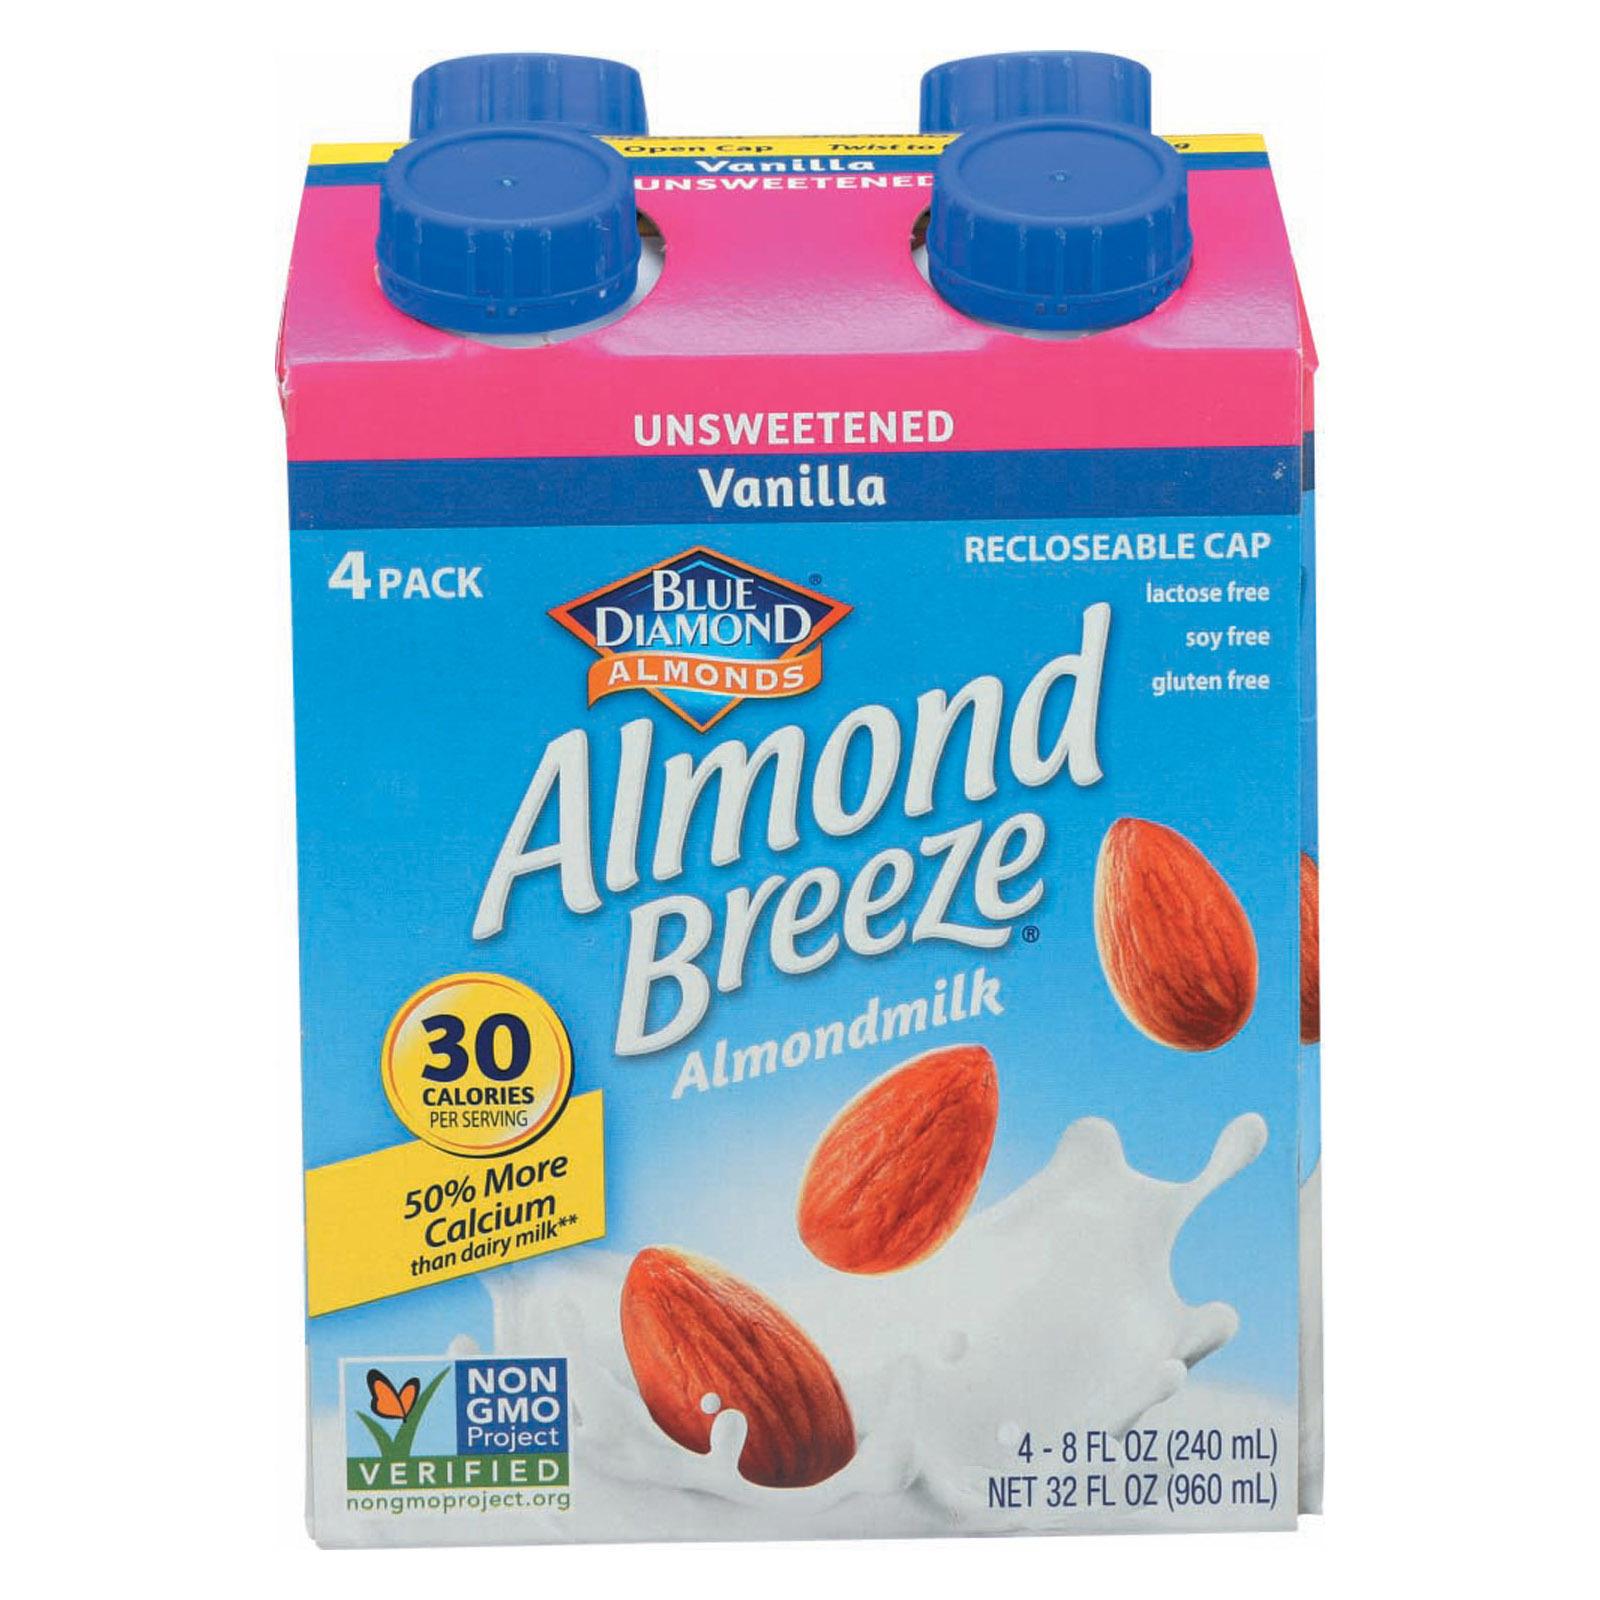 Almond Breeze Almond Breeze - Unsweetened Vanilla - Case of 6 - 4/8 oz